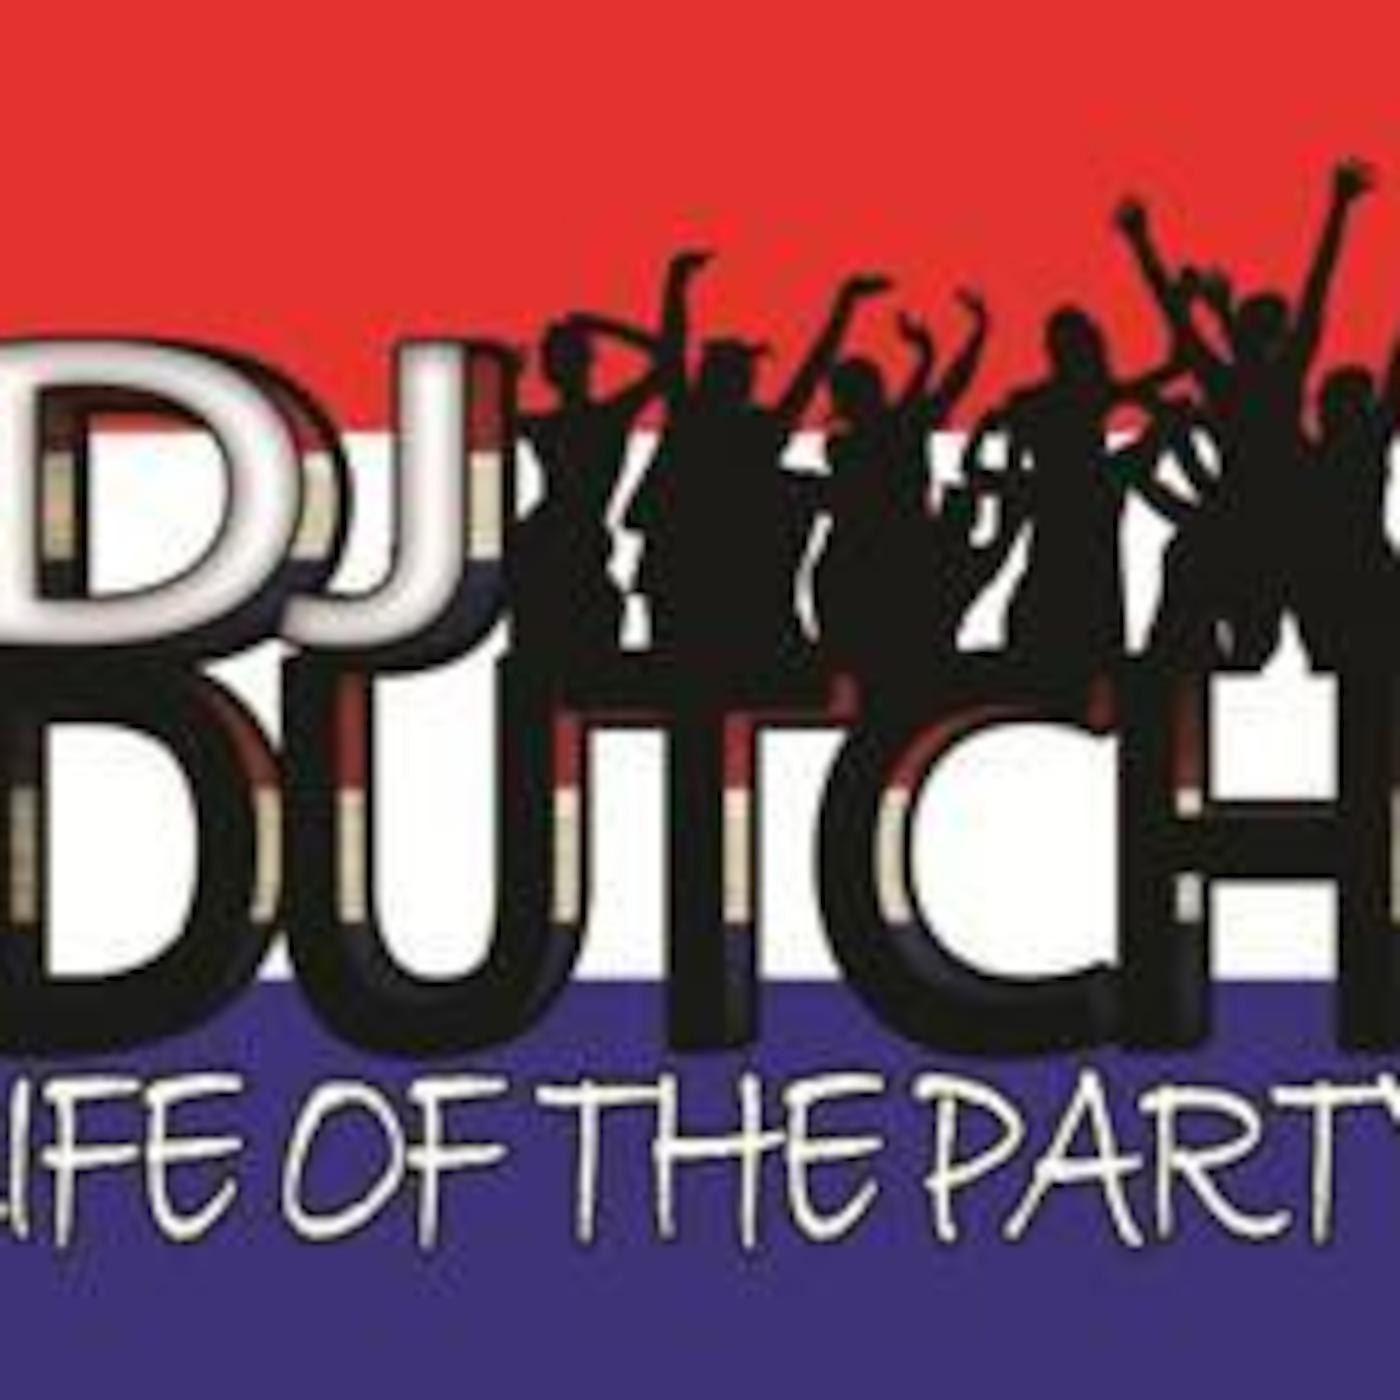 DJ Dutch Exstacy